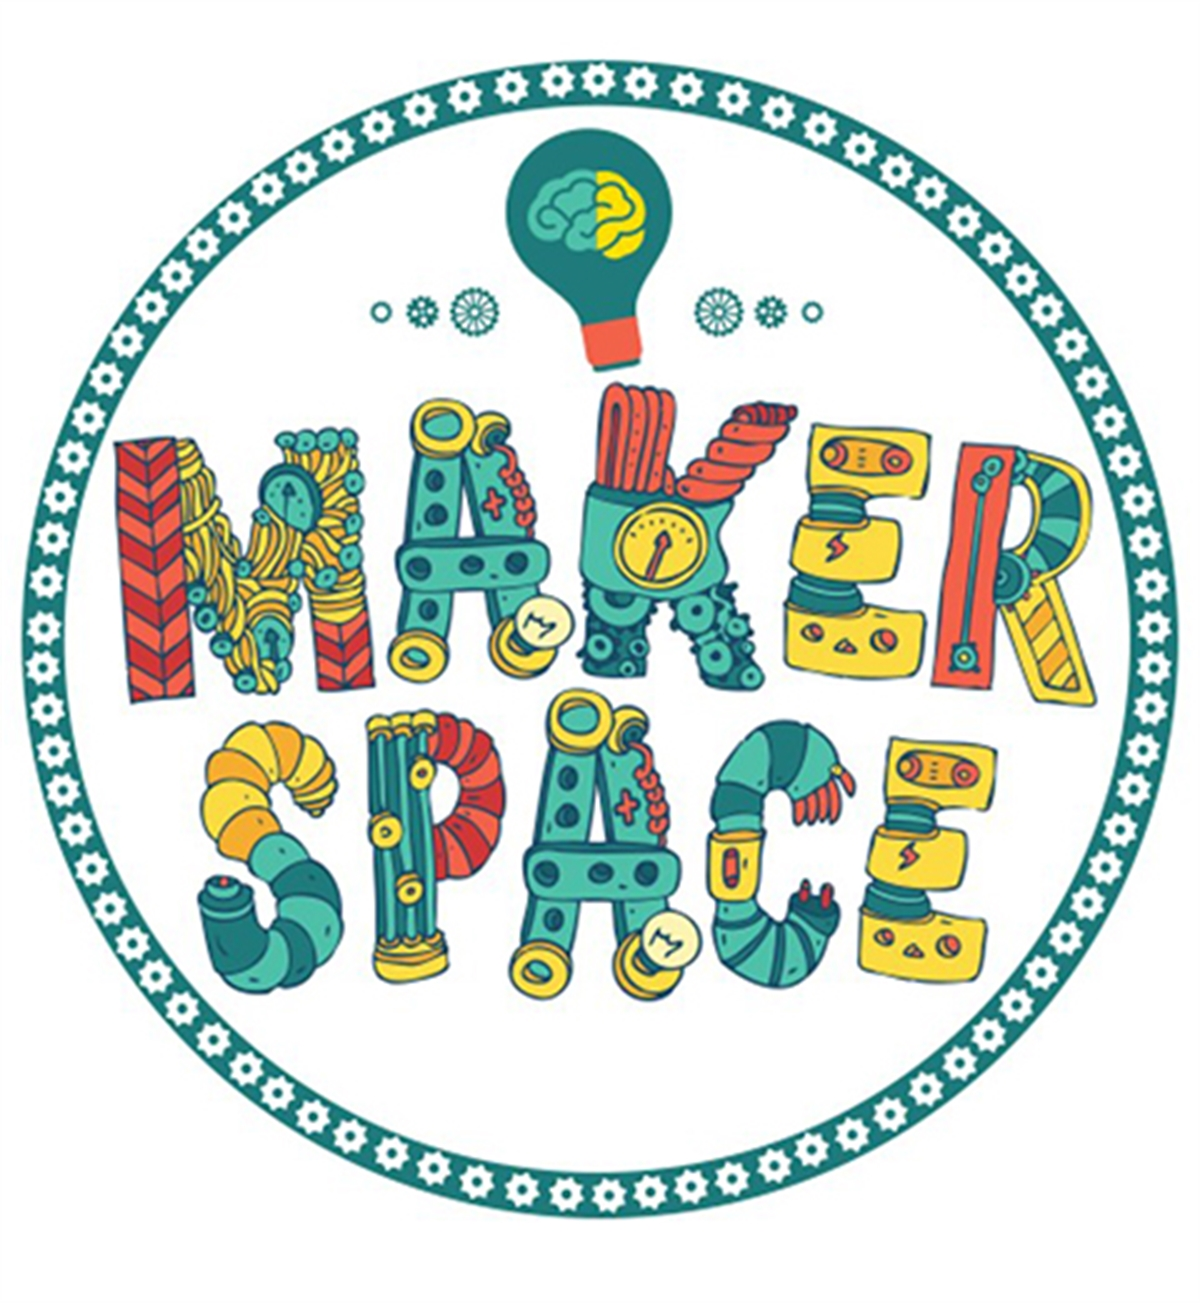 MiY Makerspace